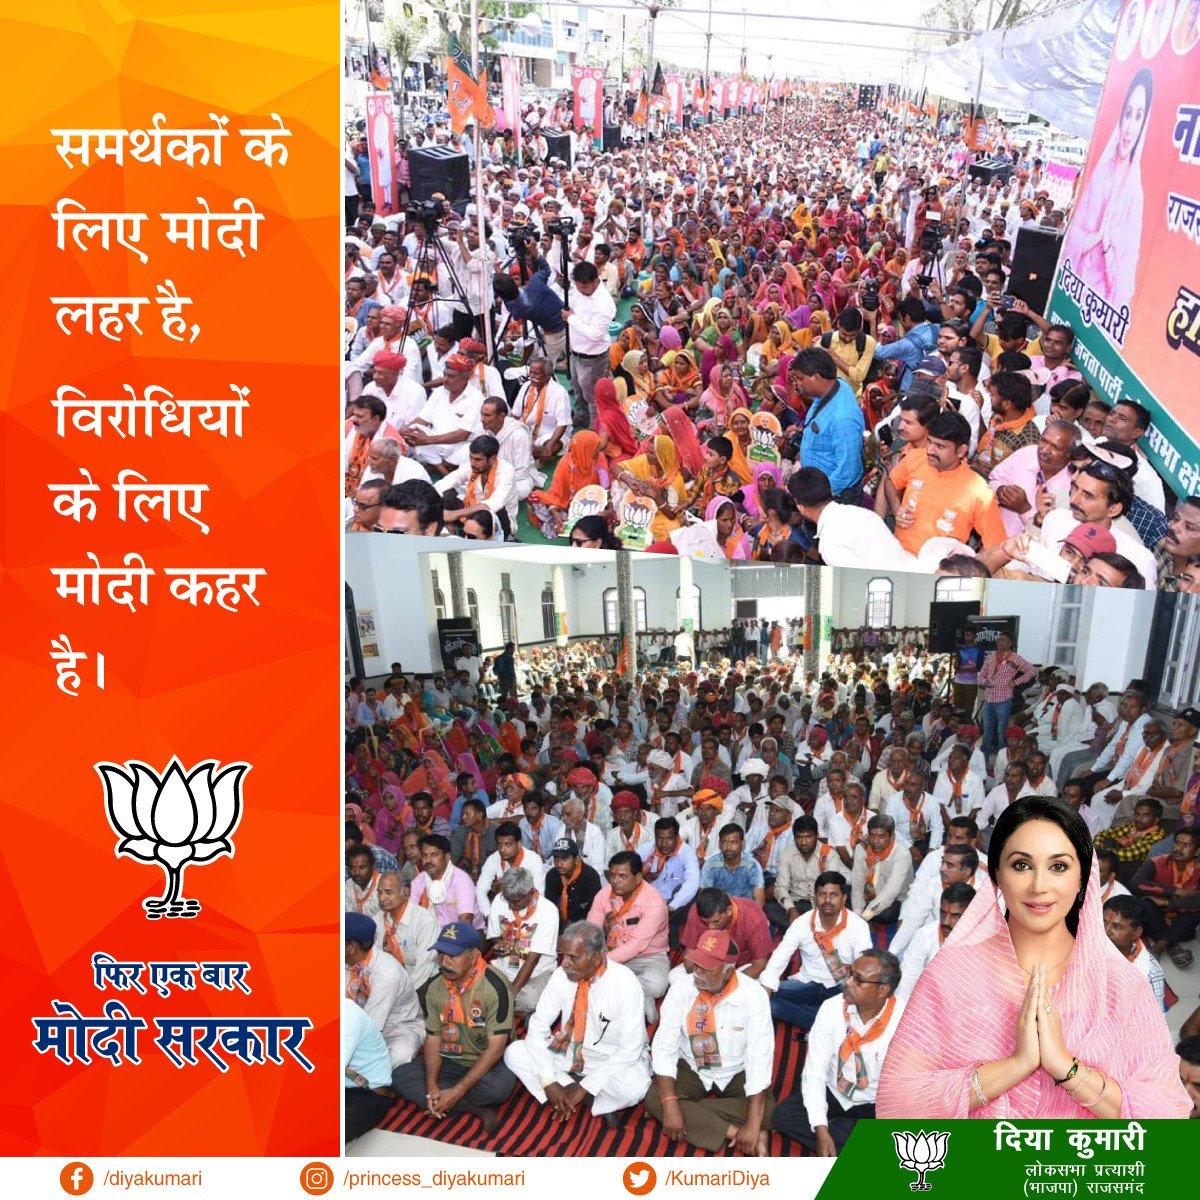 समर्थकों के लिए मोदी लहर है, विरोधियों के लिए मोदी कहर है। #Rajsamand #Rajasthan #MissionRajsamand #AapkiDiya #BhajpaPhirSe #MainBhiChowkidar #EveryVoteForModi #FridayFeeling